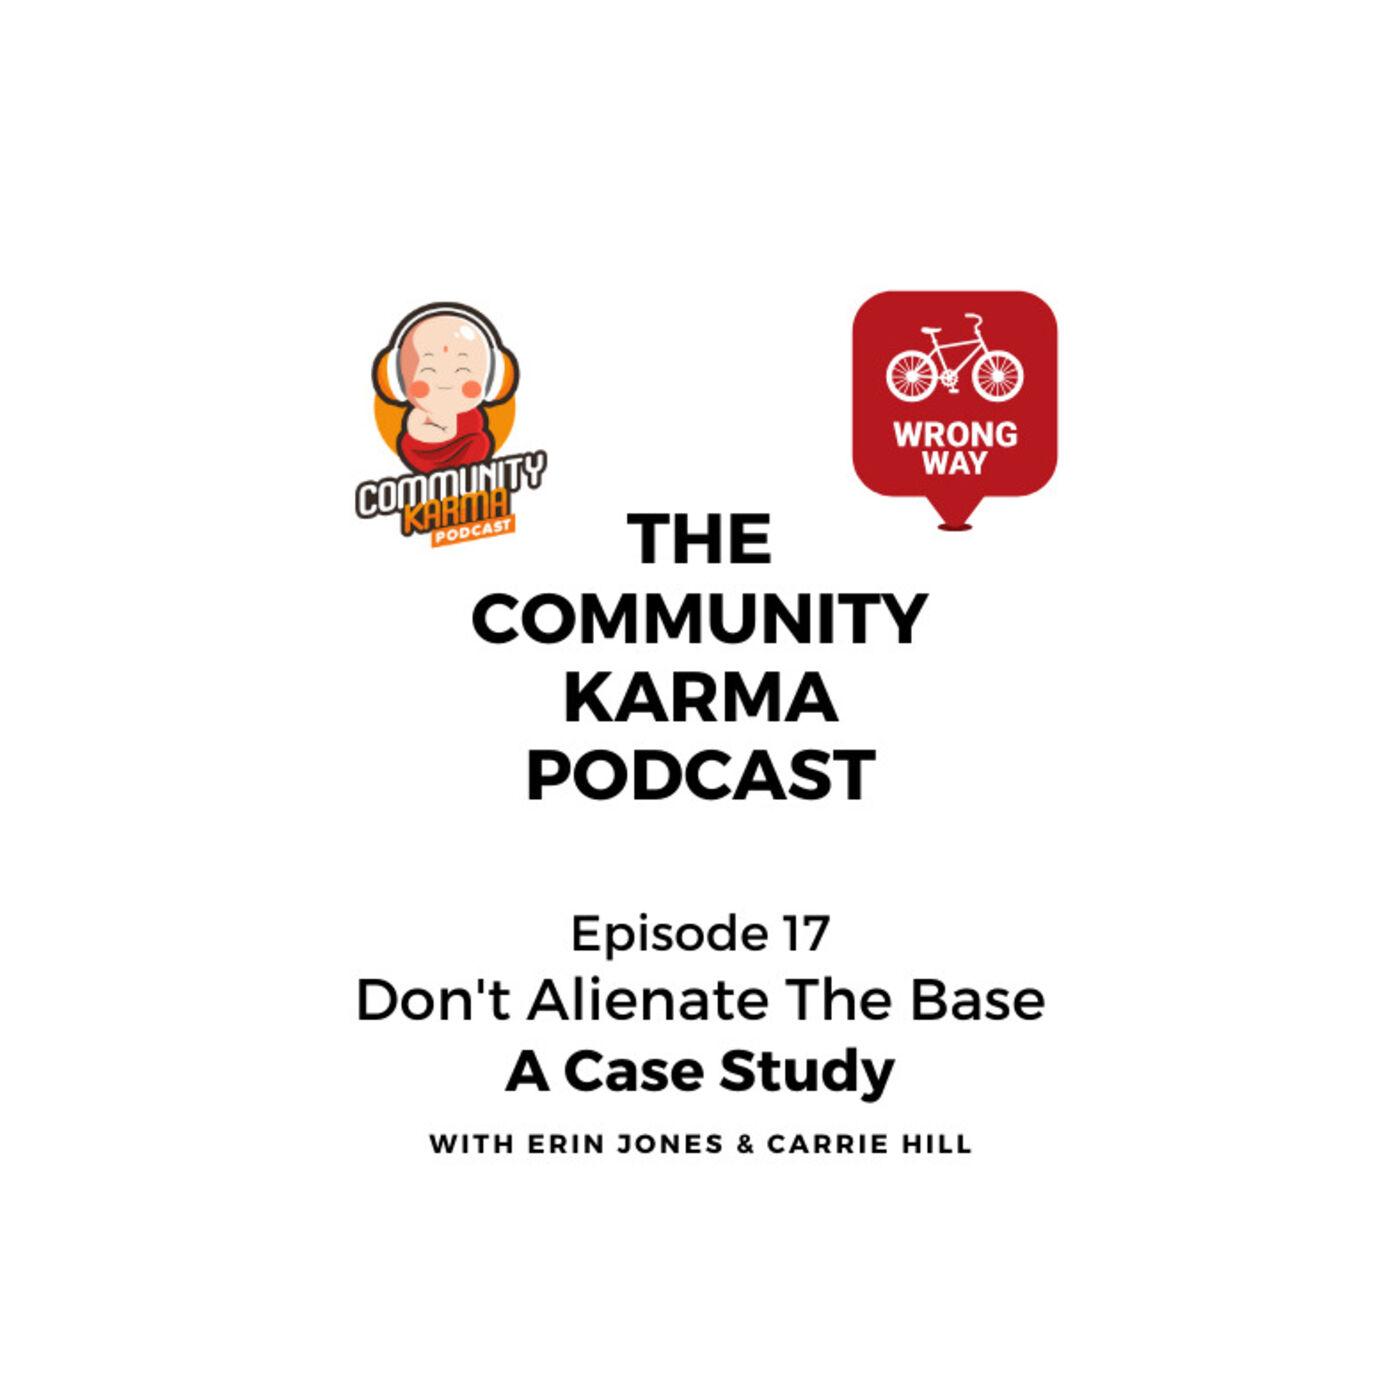 Episode 17: Don't Alienate the Base - A Case Study